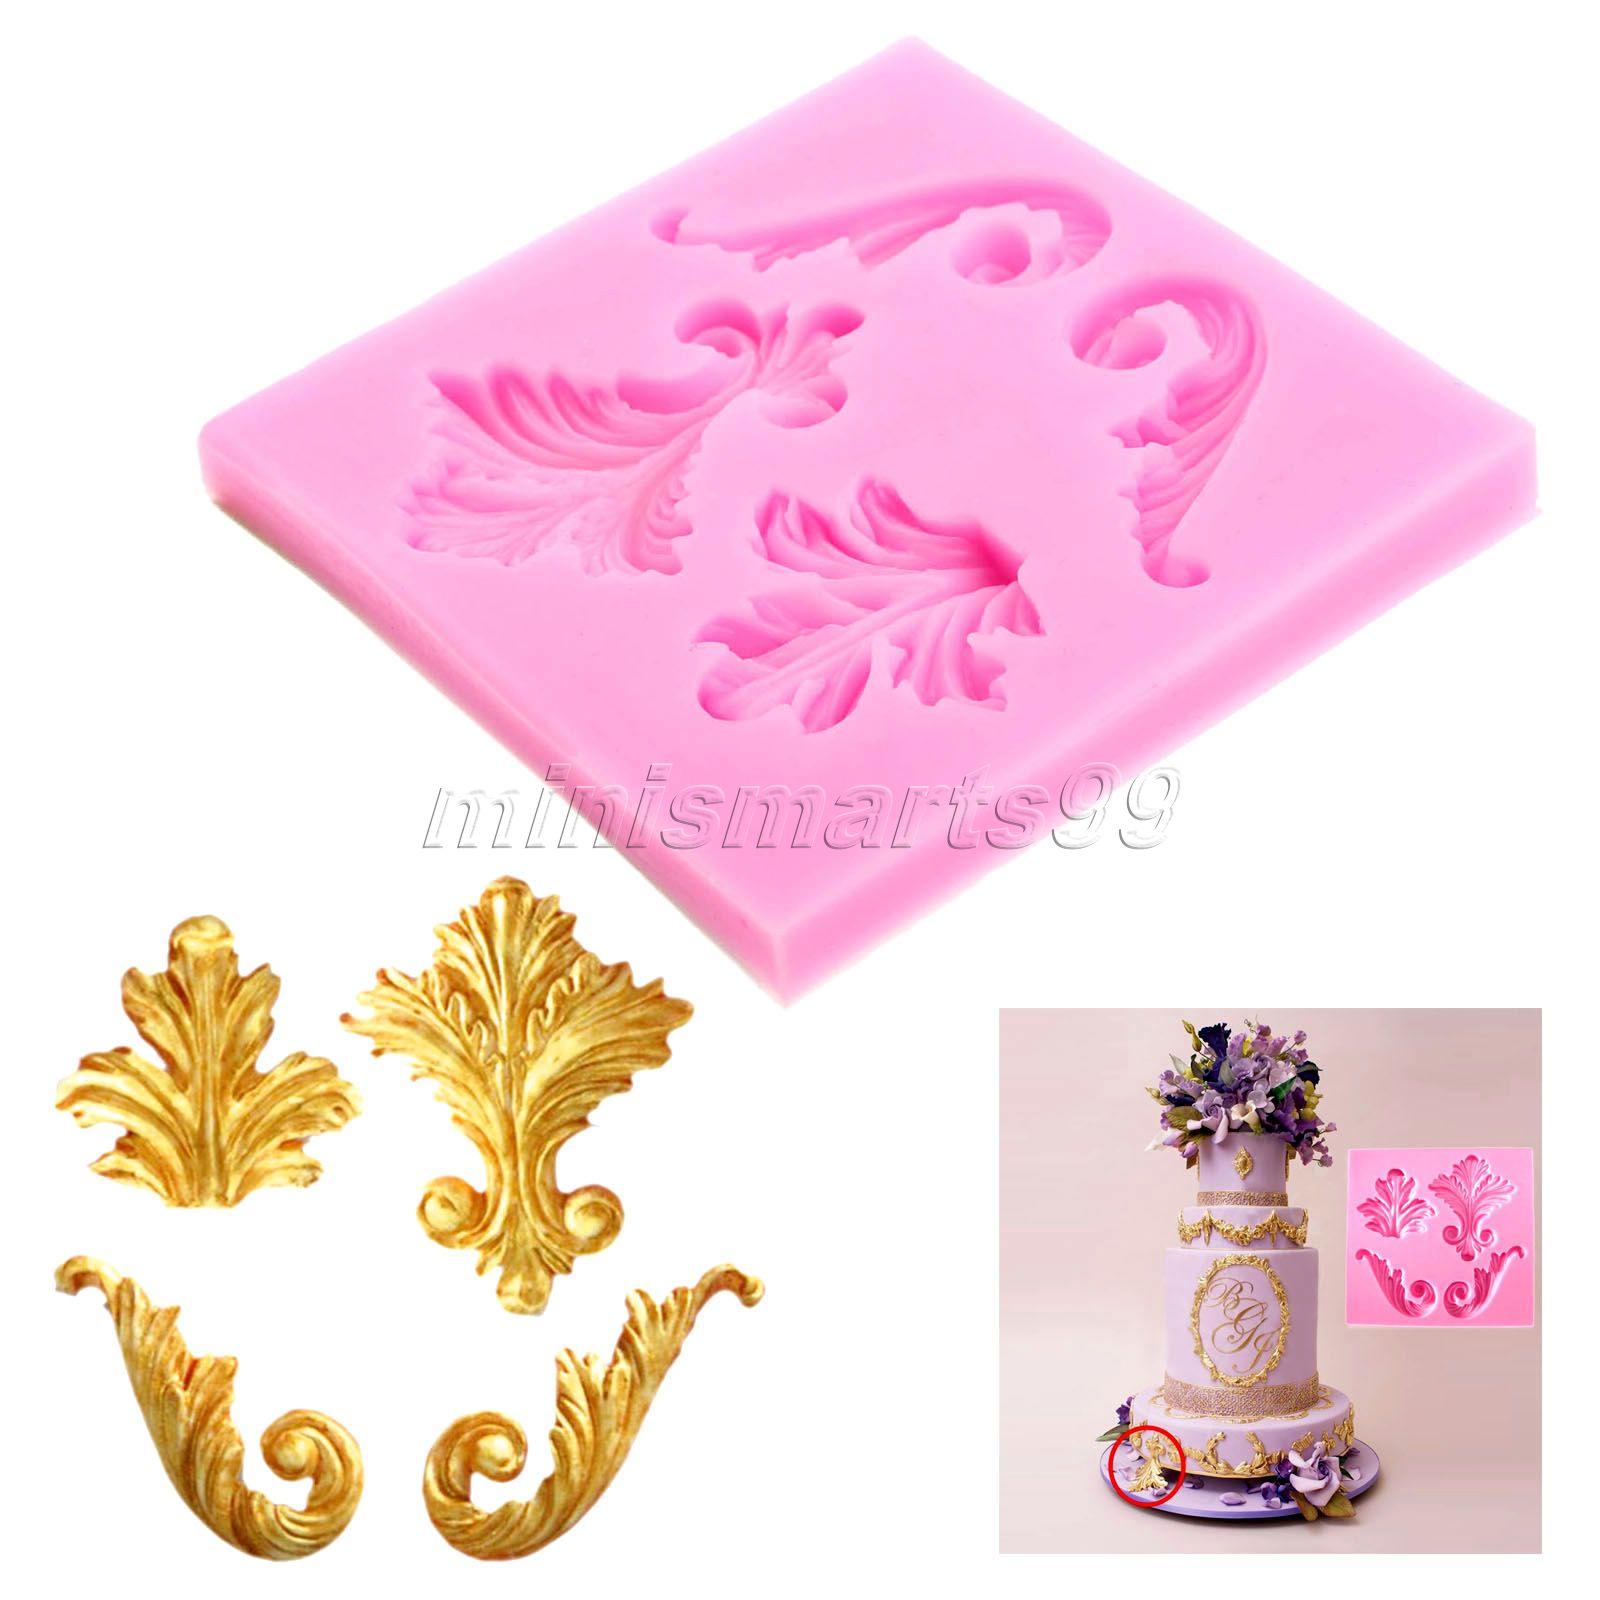 Silicone Moulds Fondant Cake Decorating Tools Sugarcraft Cupcake Confeitaria Kitchen Accessories Stampi In Silicone Soap Mold